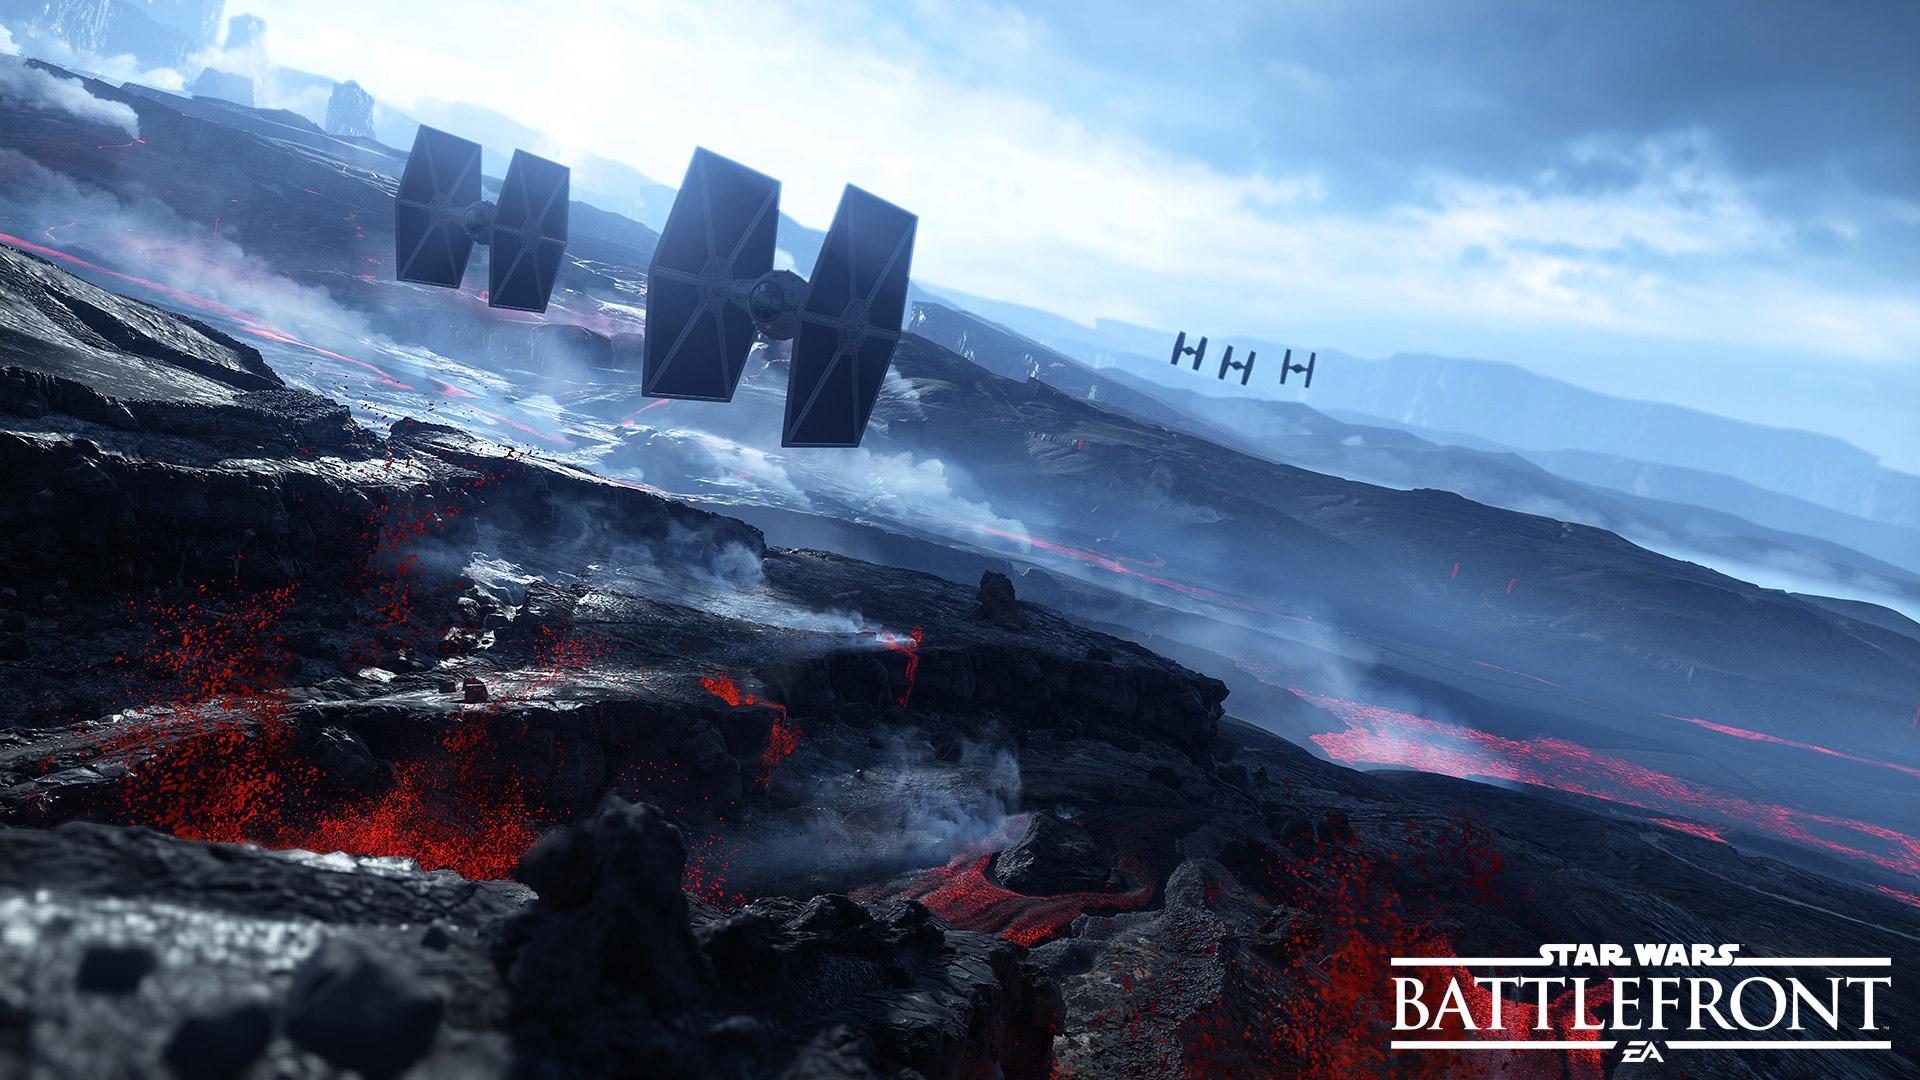 Star Wars™ Battlefront™ Wallpapers